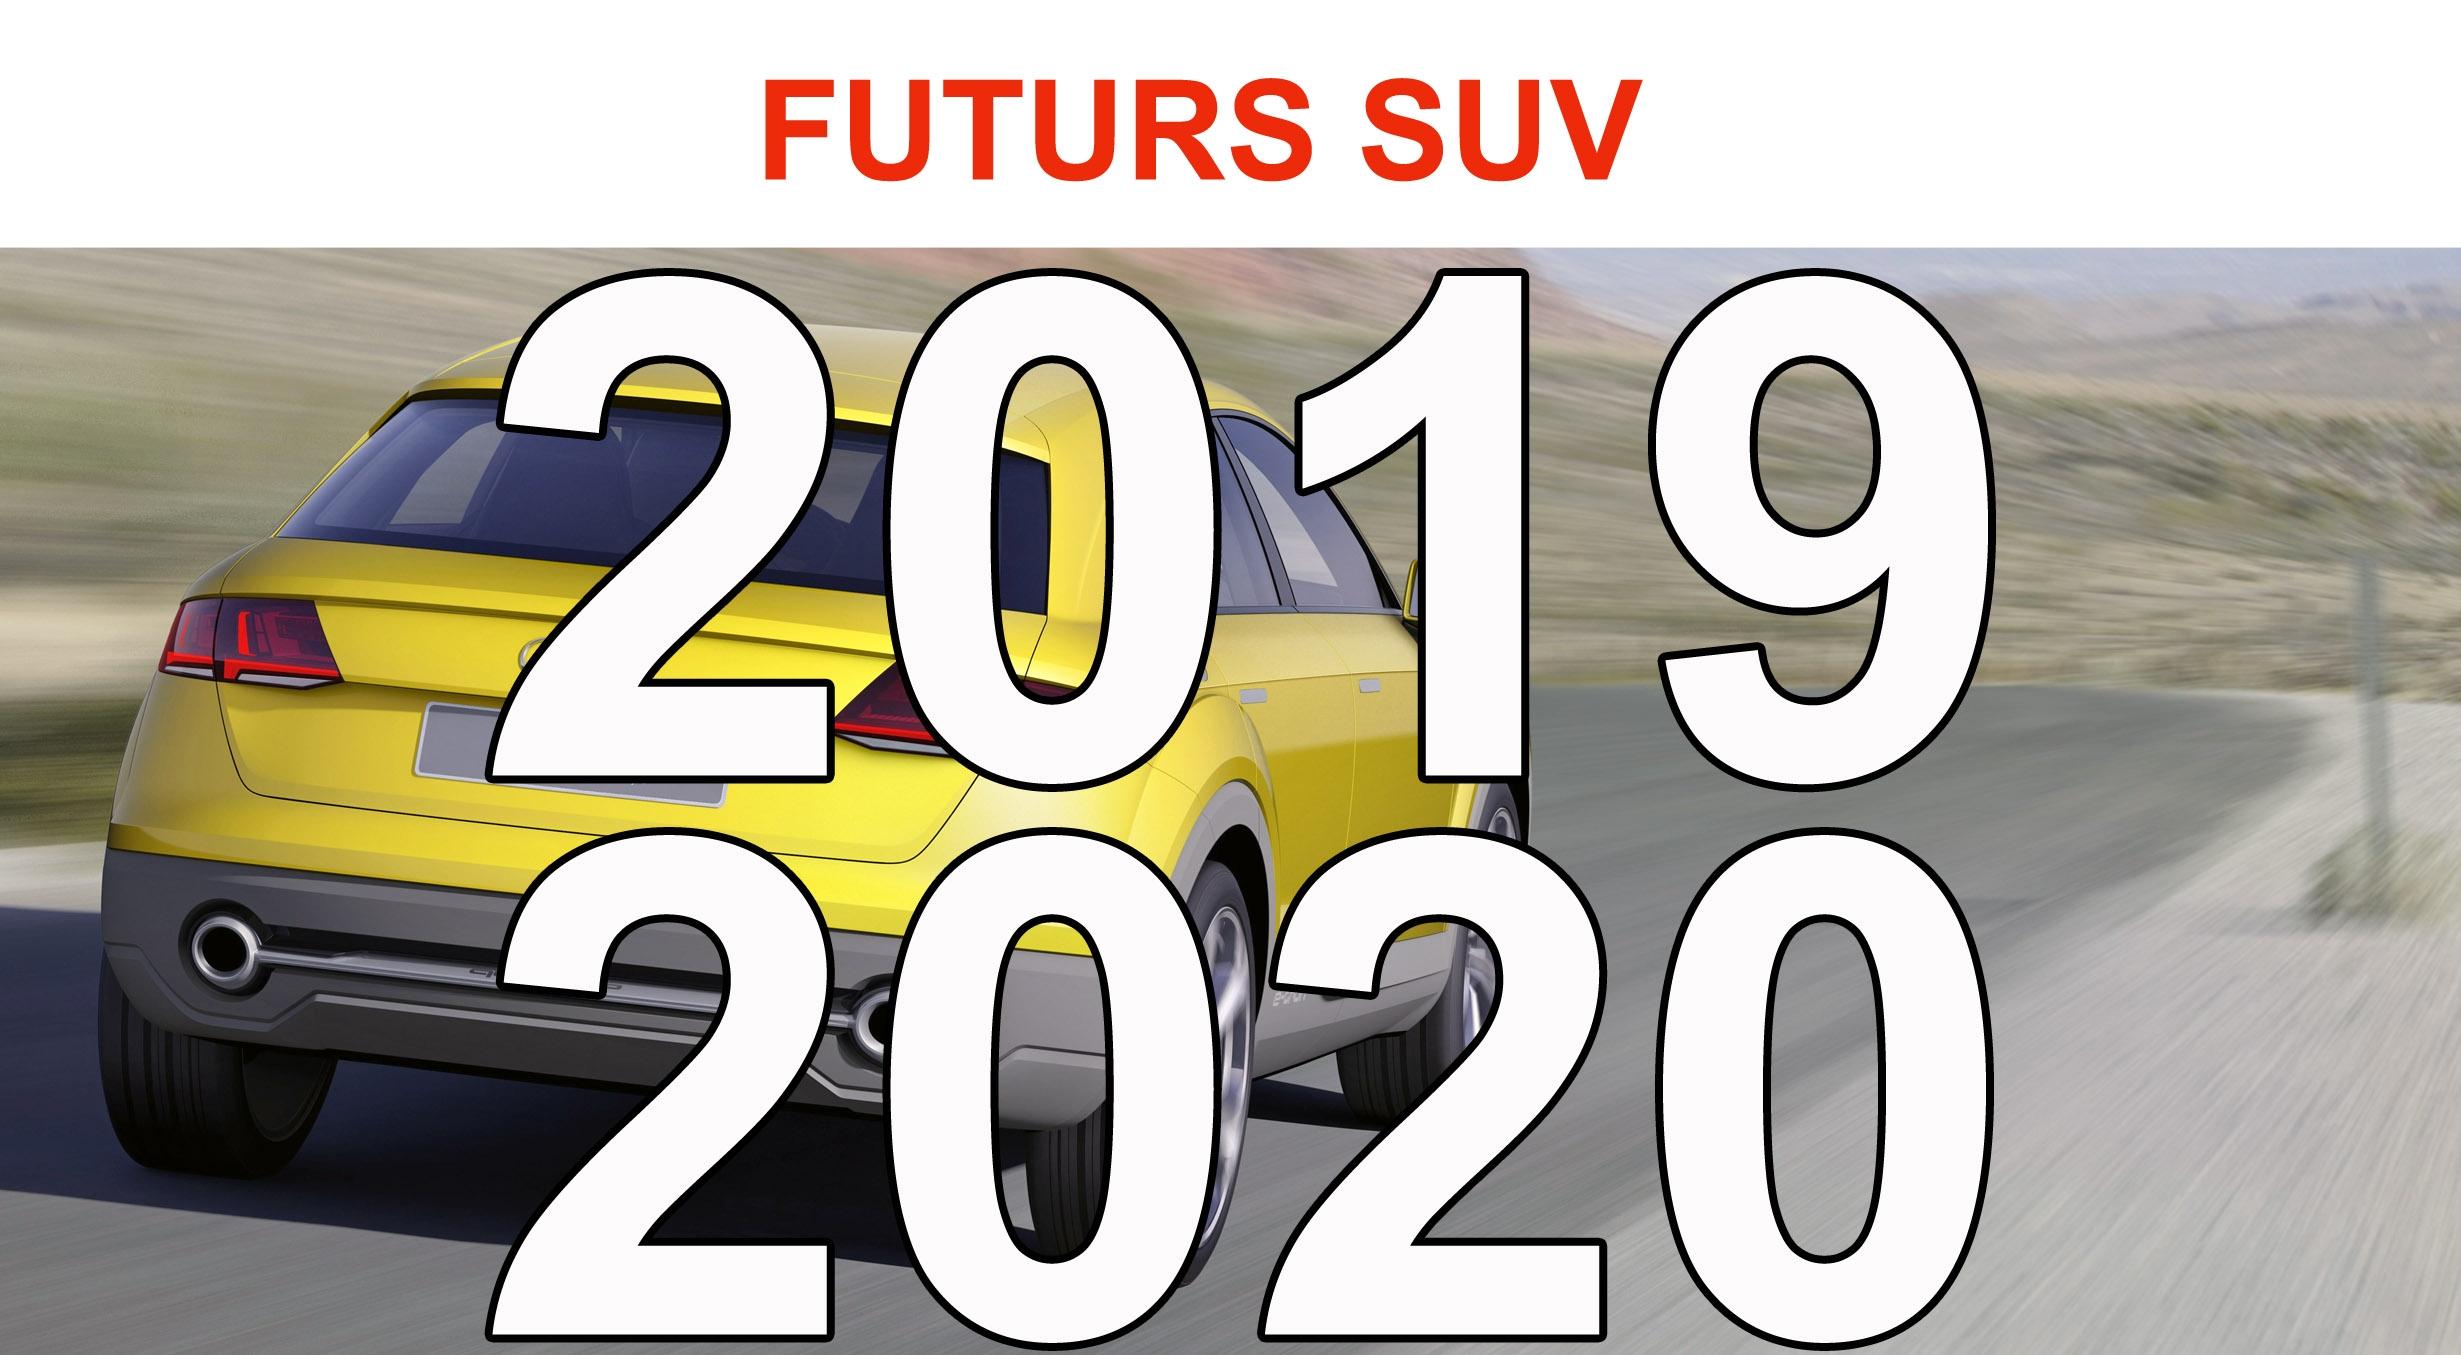 Futurs SUV : 2019 et 2020